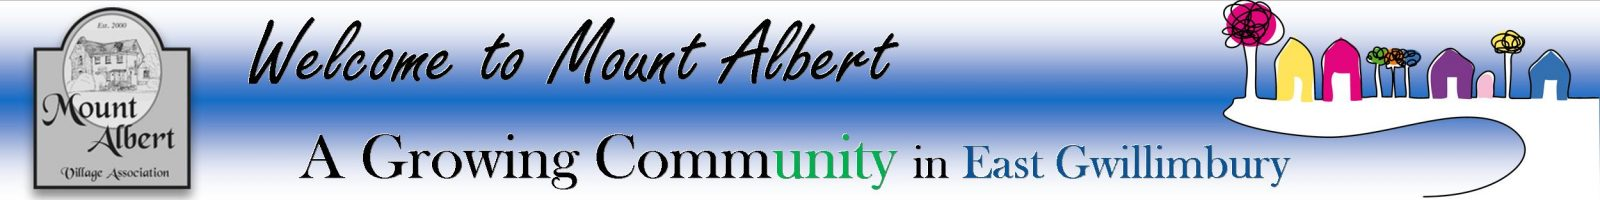 Mount Albert Village Association